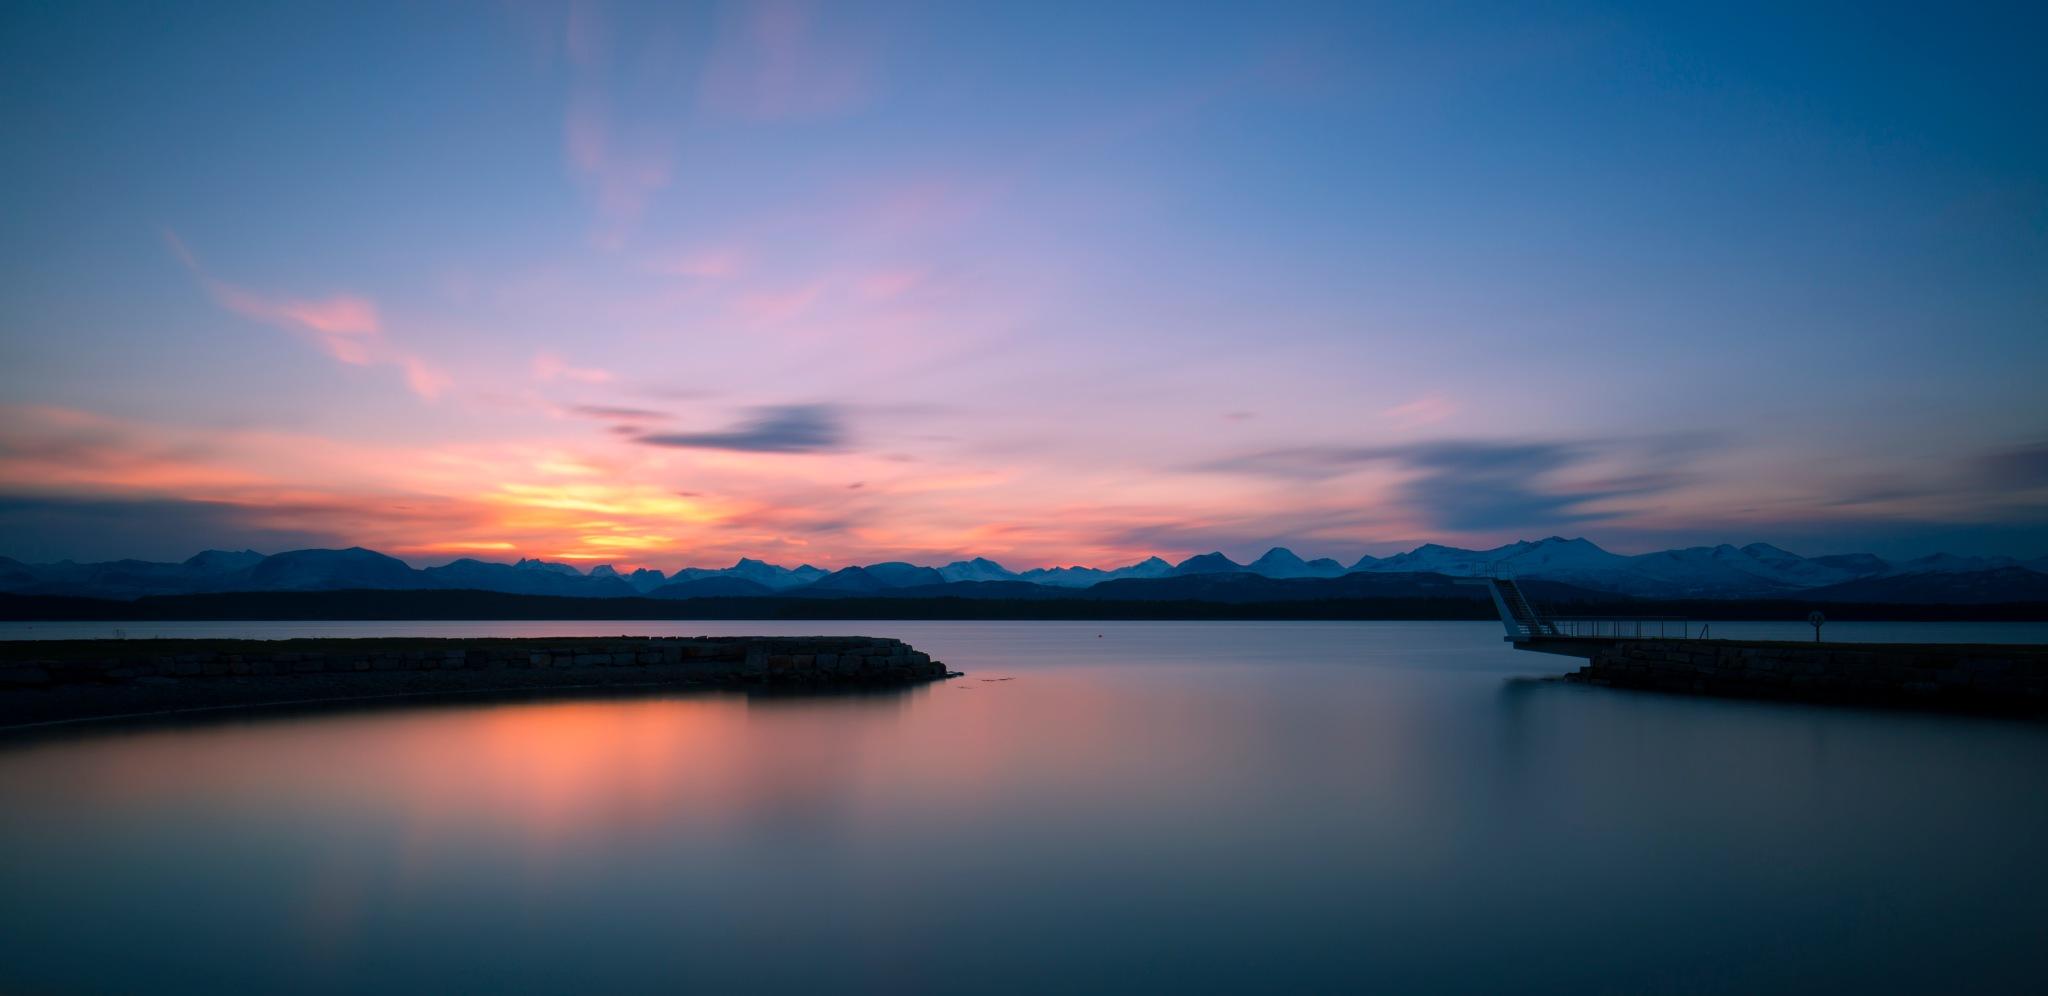 Sunrise by Line Glomseth